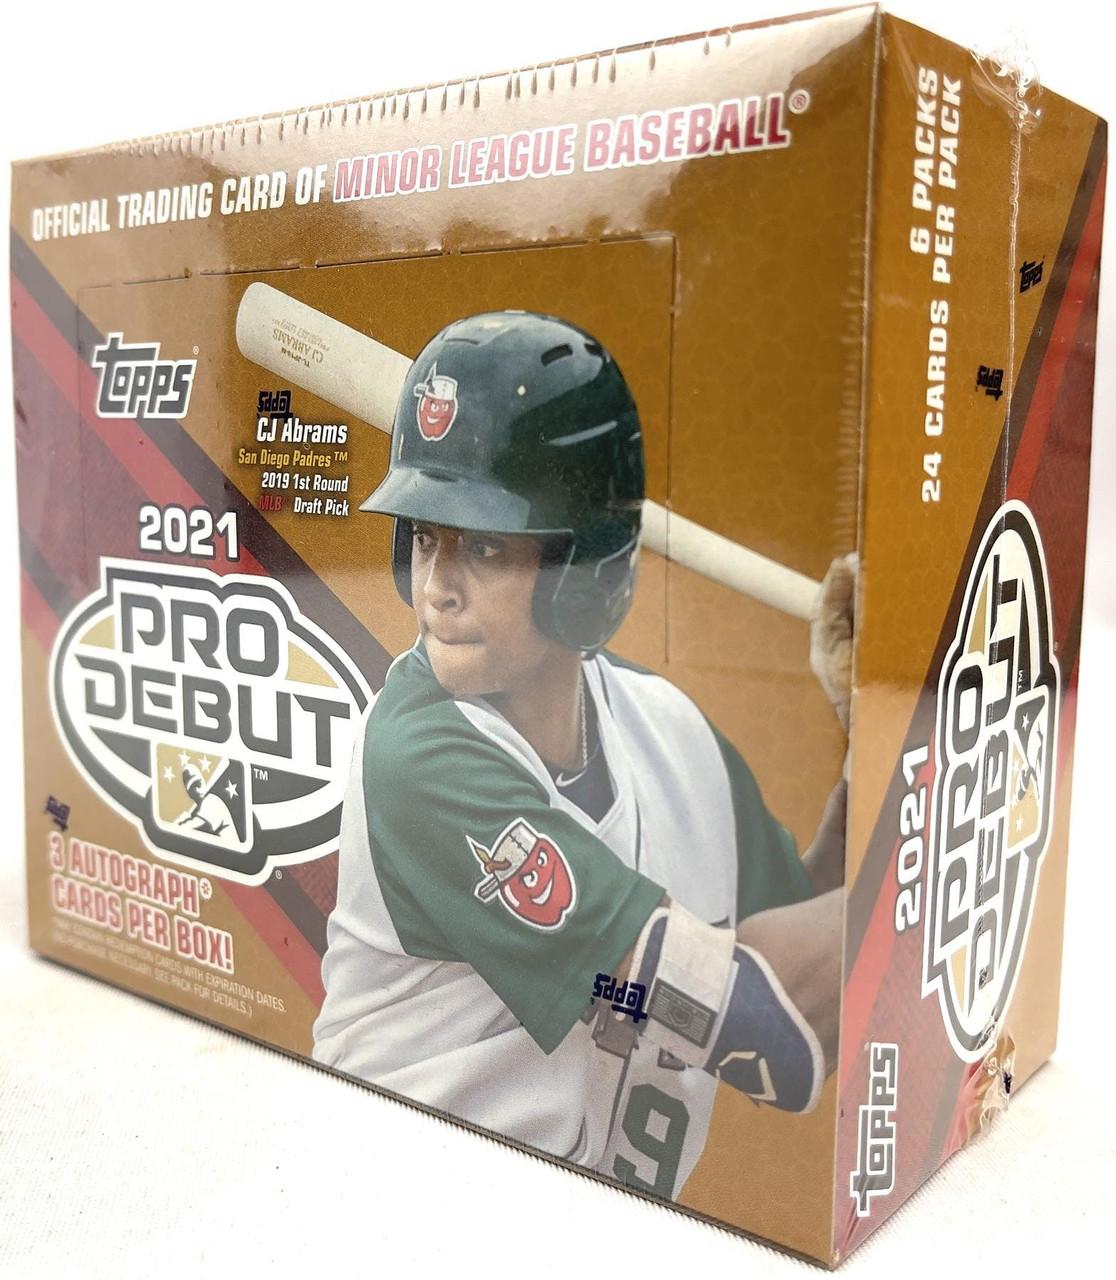 Learn who they once were said to depict. 2021 Topps Pro Debut Baseball Hta Jumbo Box The Baseball Card King Inc